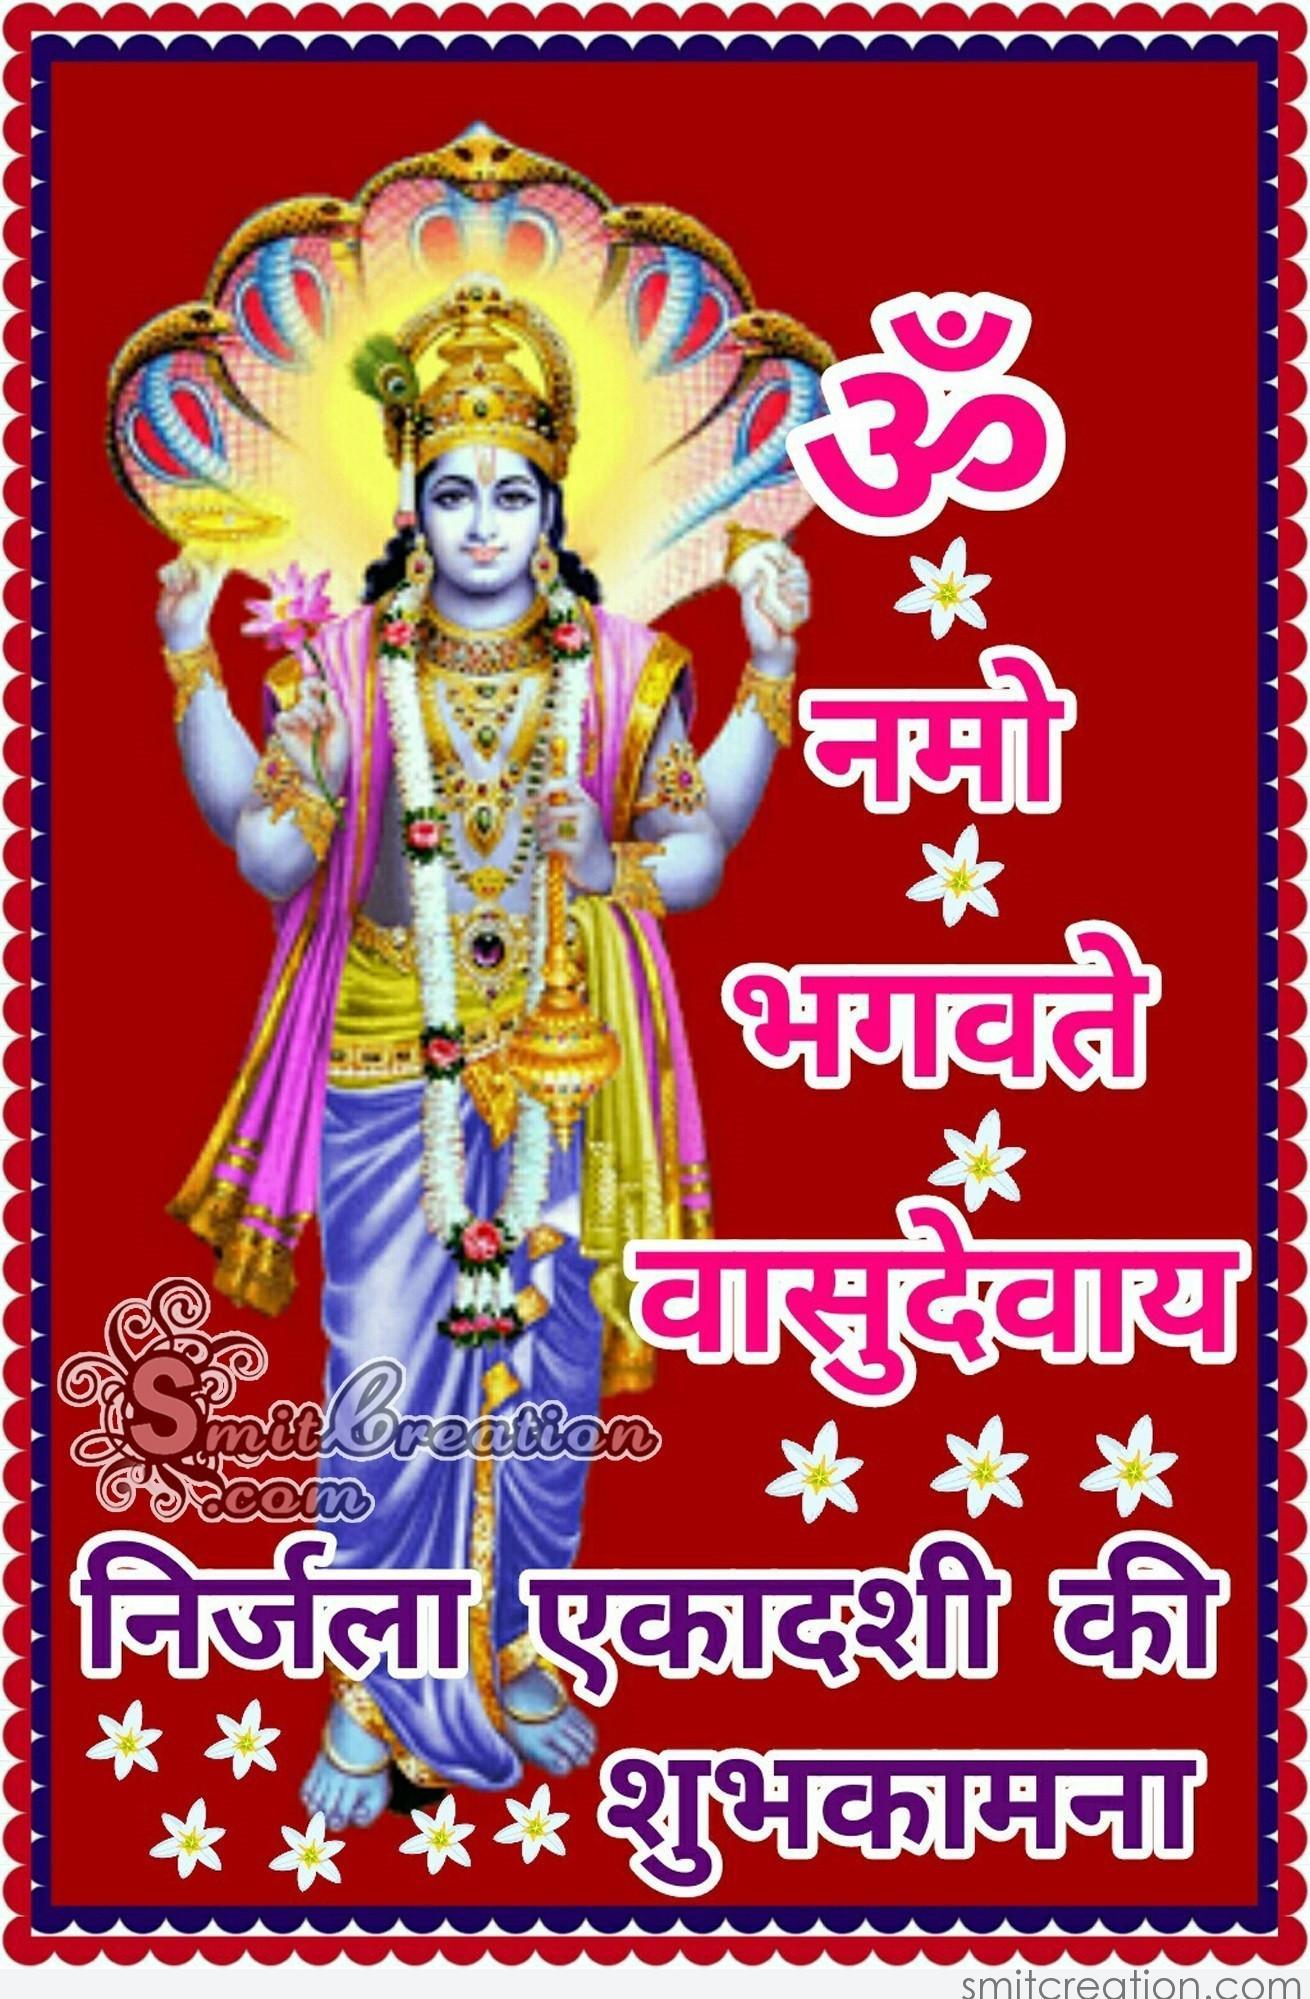 nirjala ekadashi pictures and graphics smitcreation